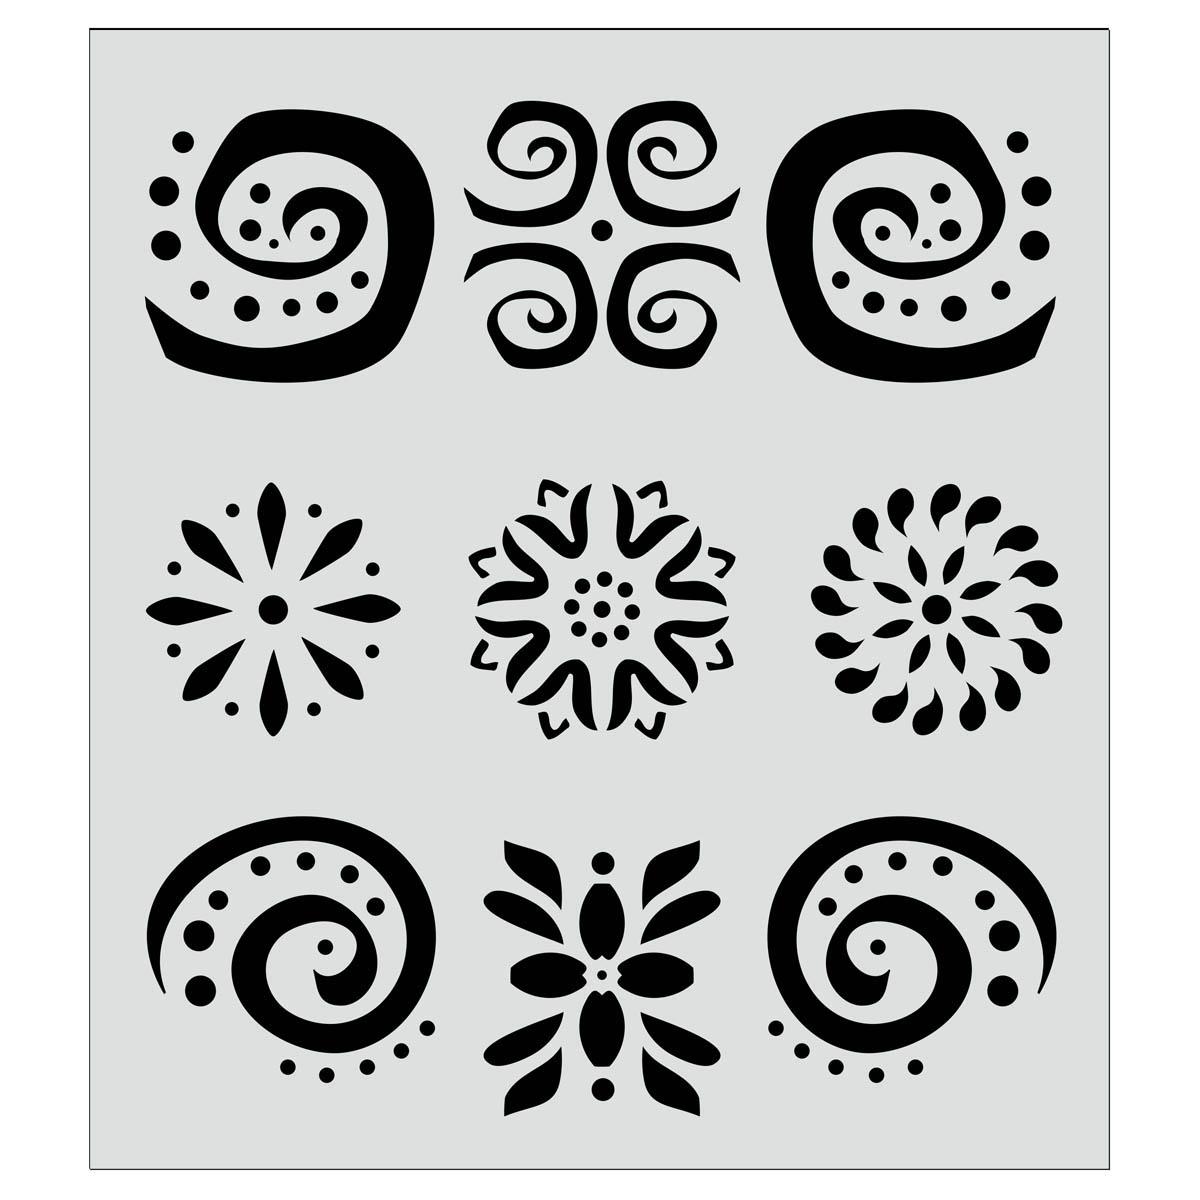 FolkArt ® Painting Stencils - Carribbean